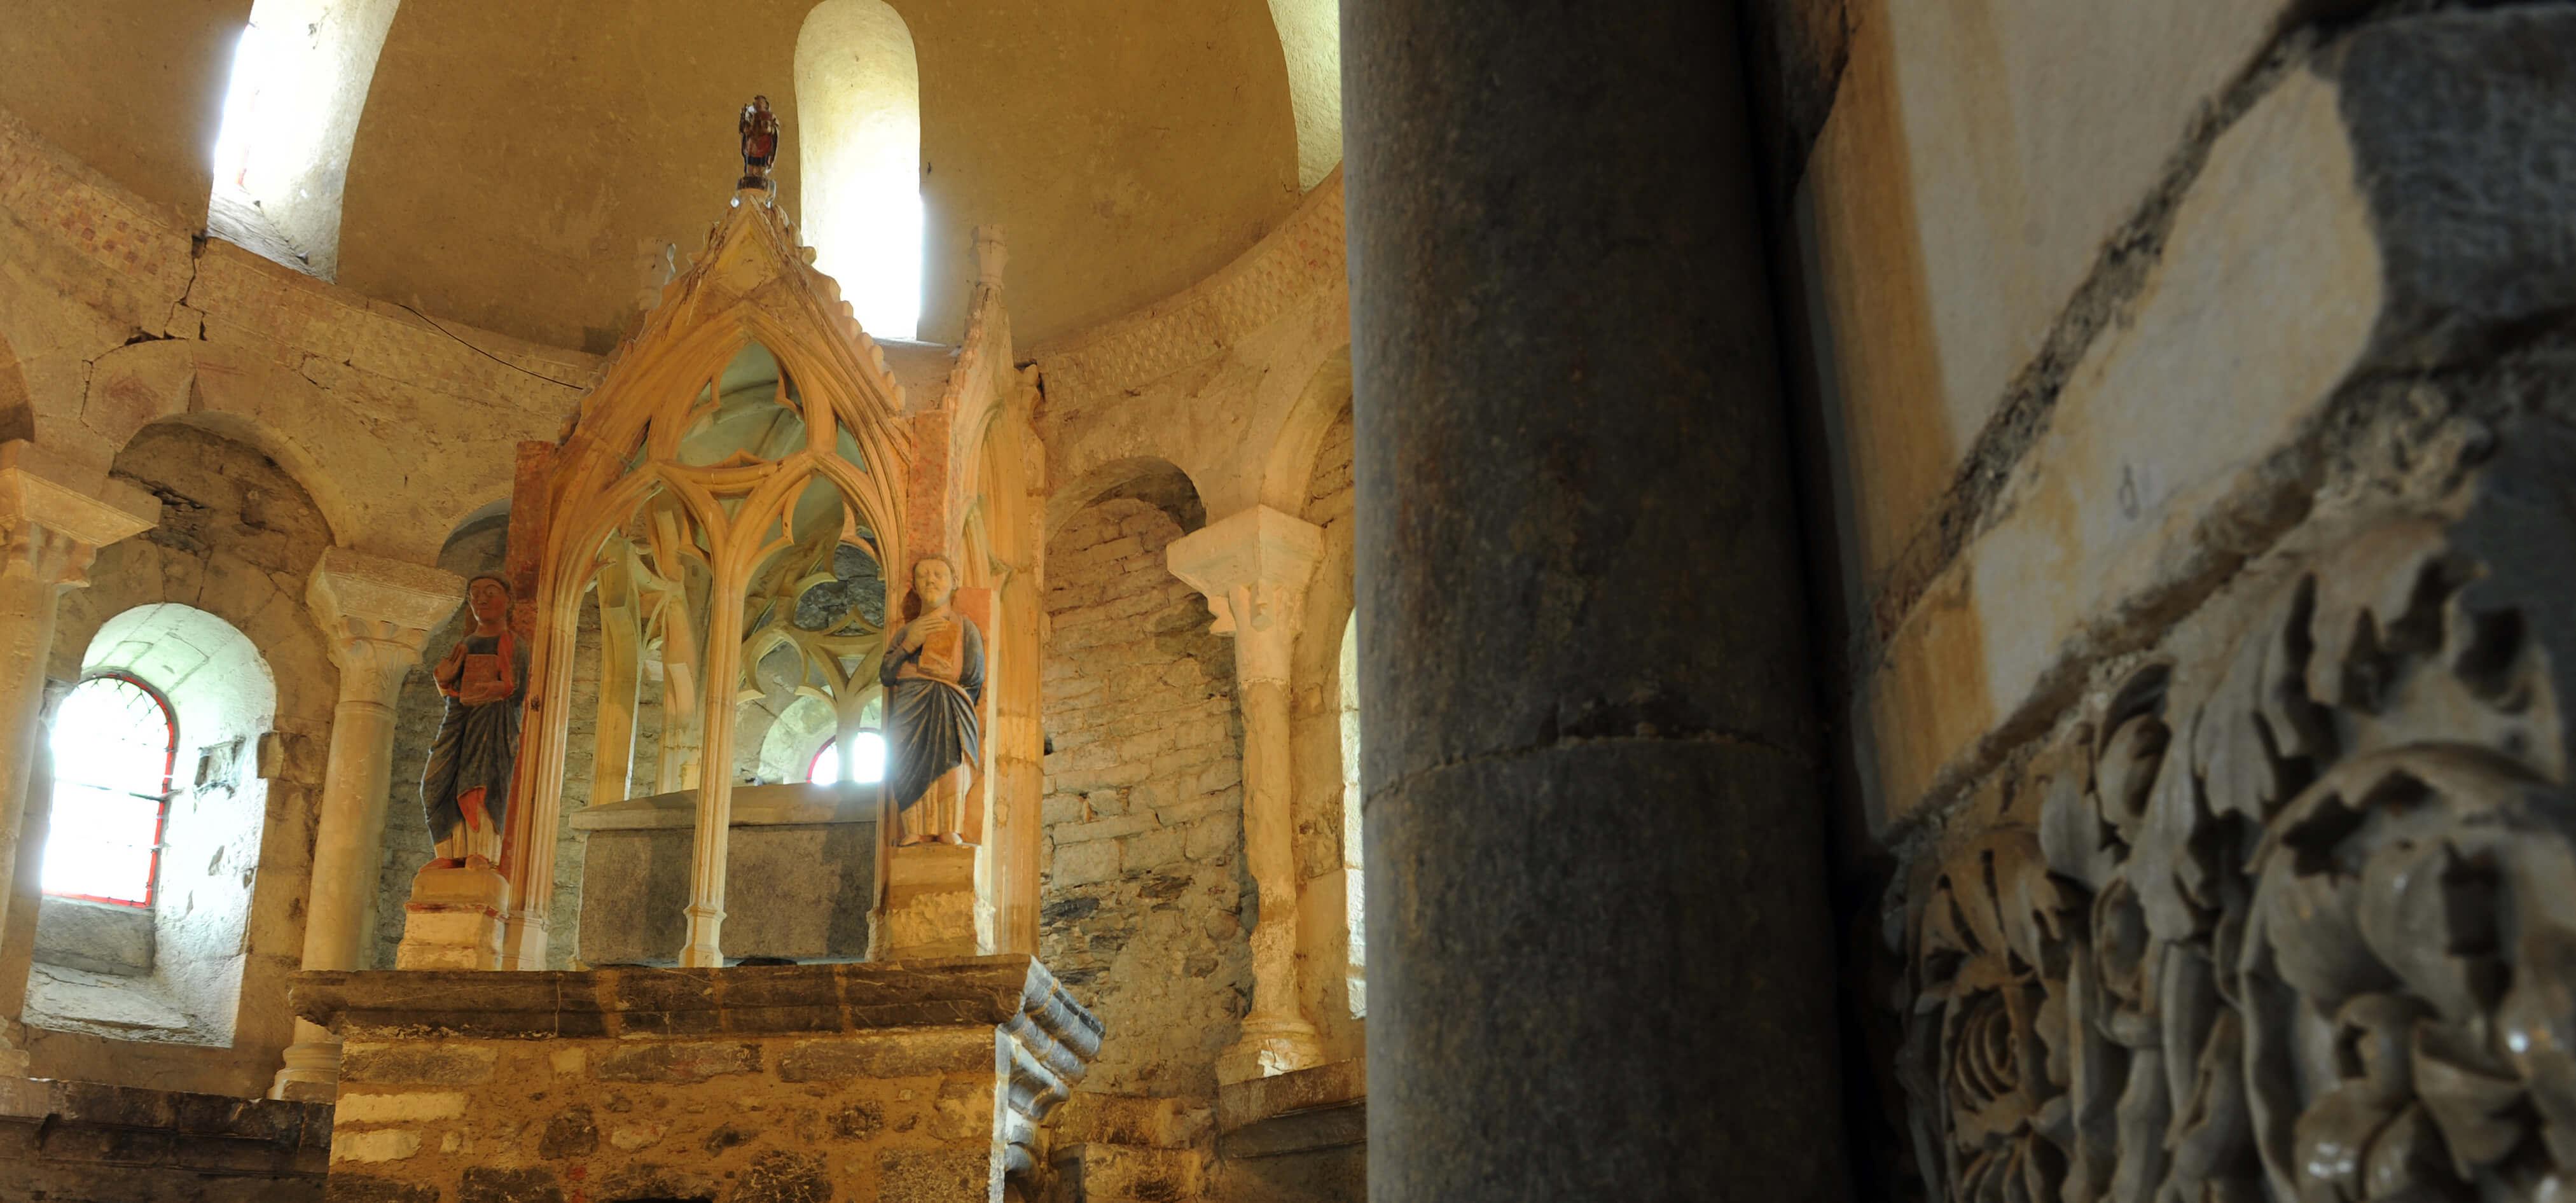 Basilique Saint-Just©ACIR / JJ Gelbart